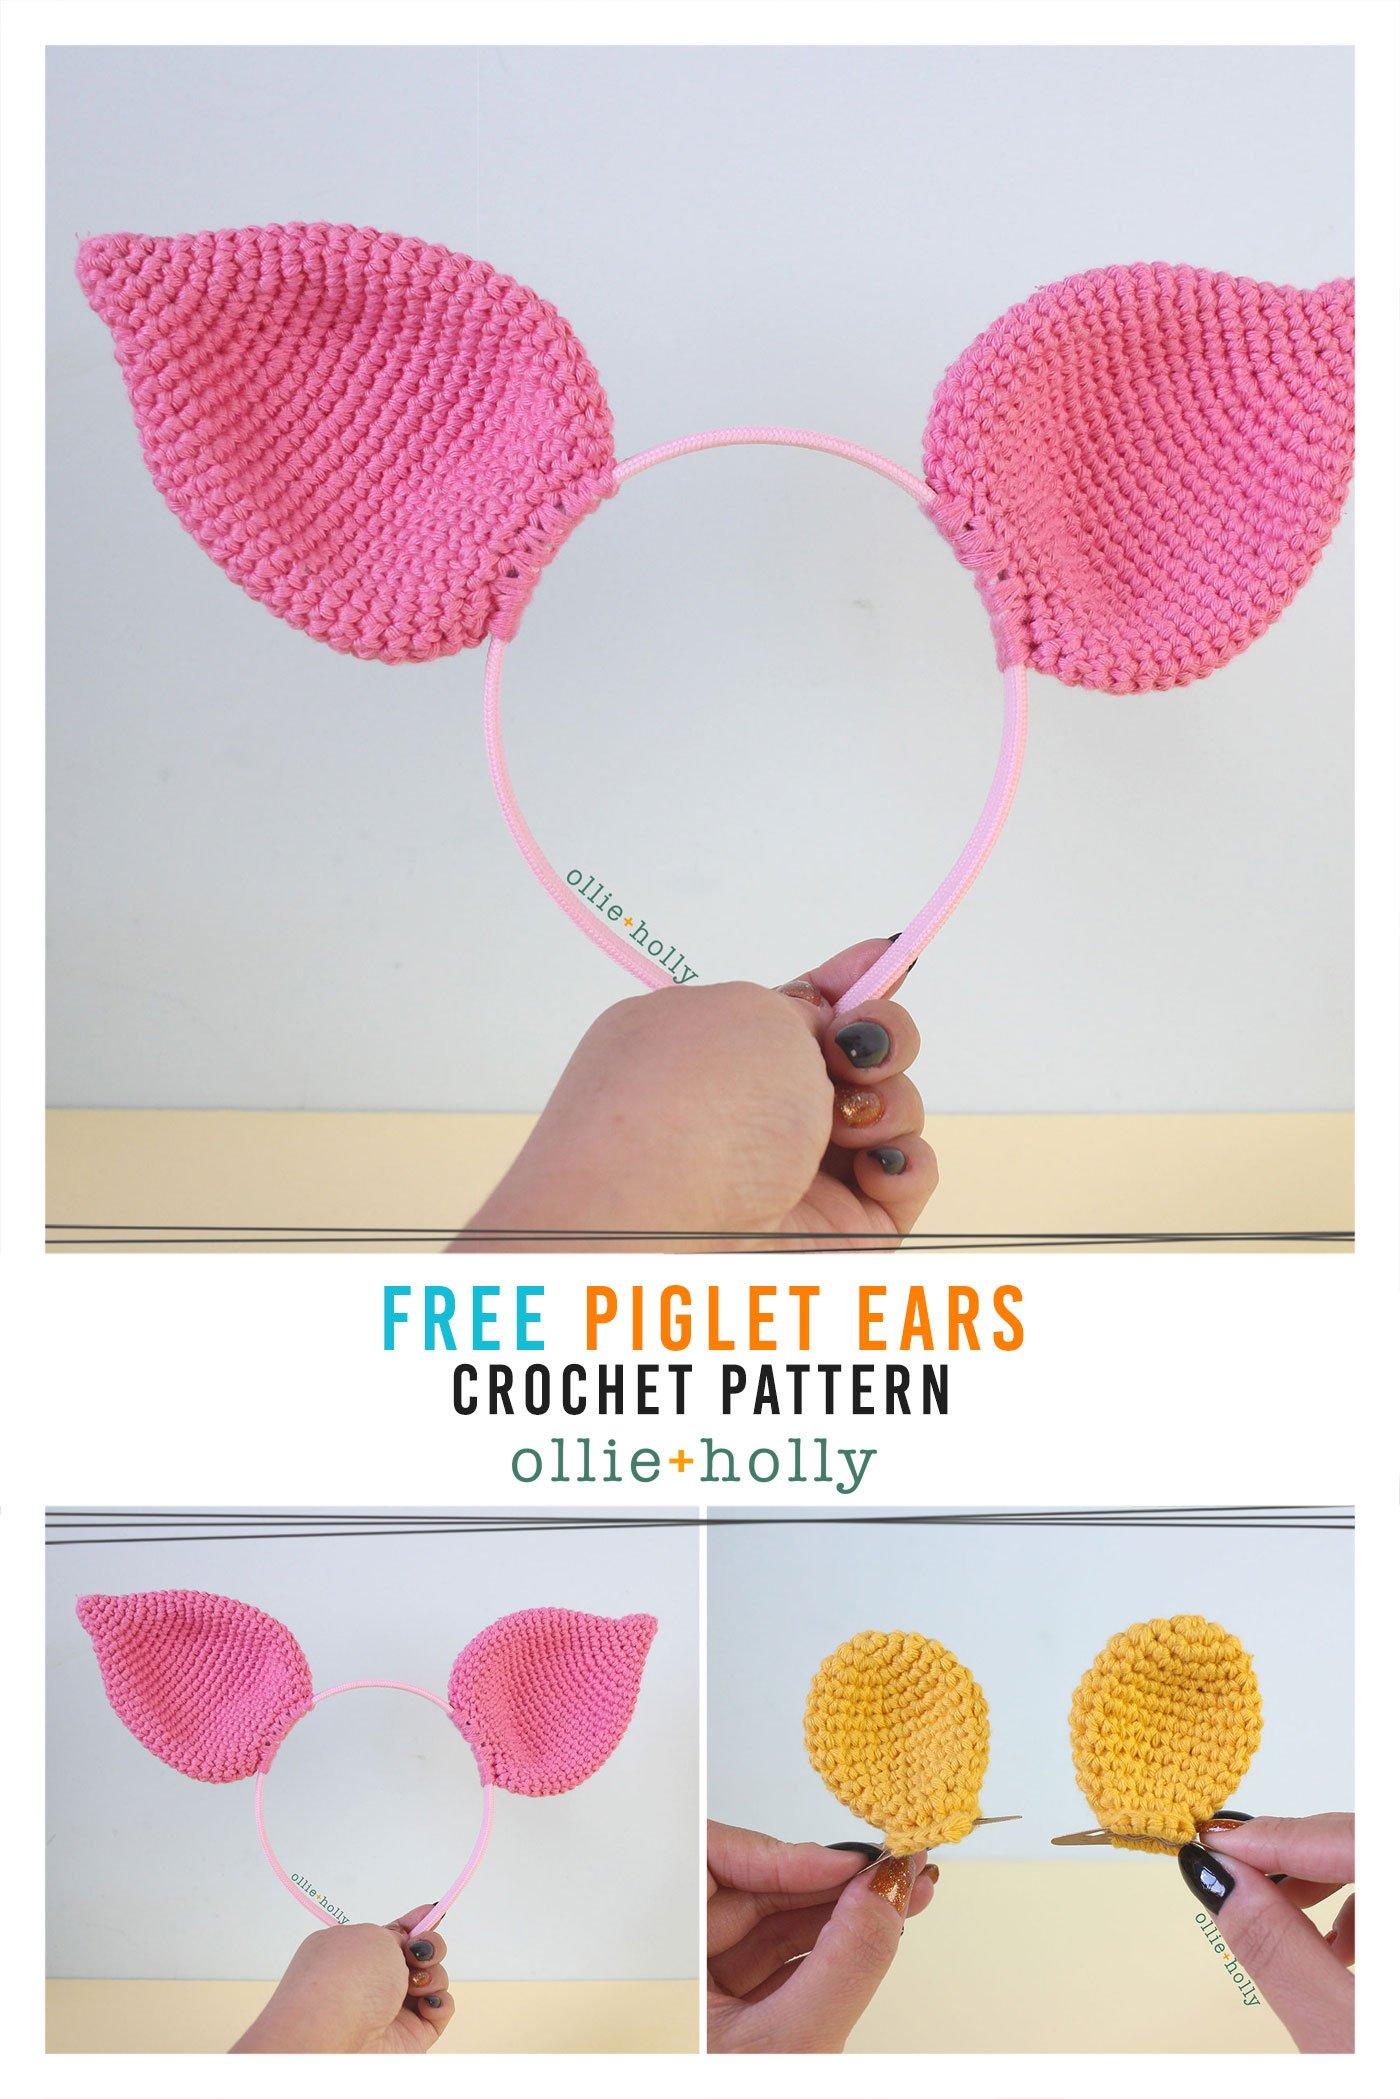 Free Piglet (Winnie the Pooh) Crochet DIY Headband Disney Ears Pattern